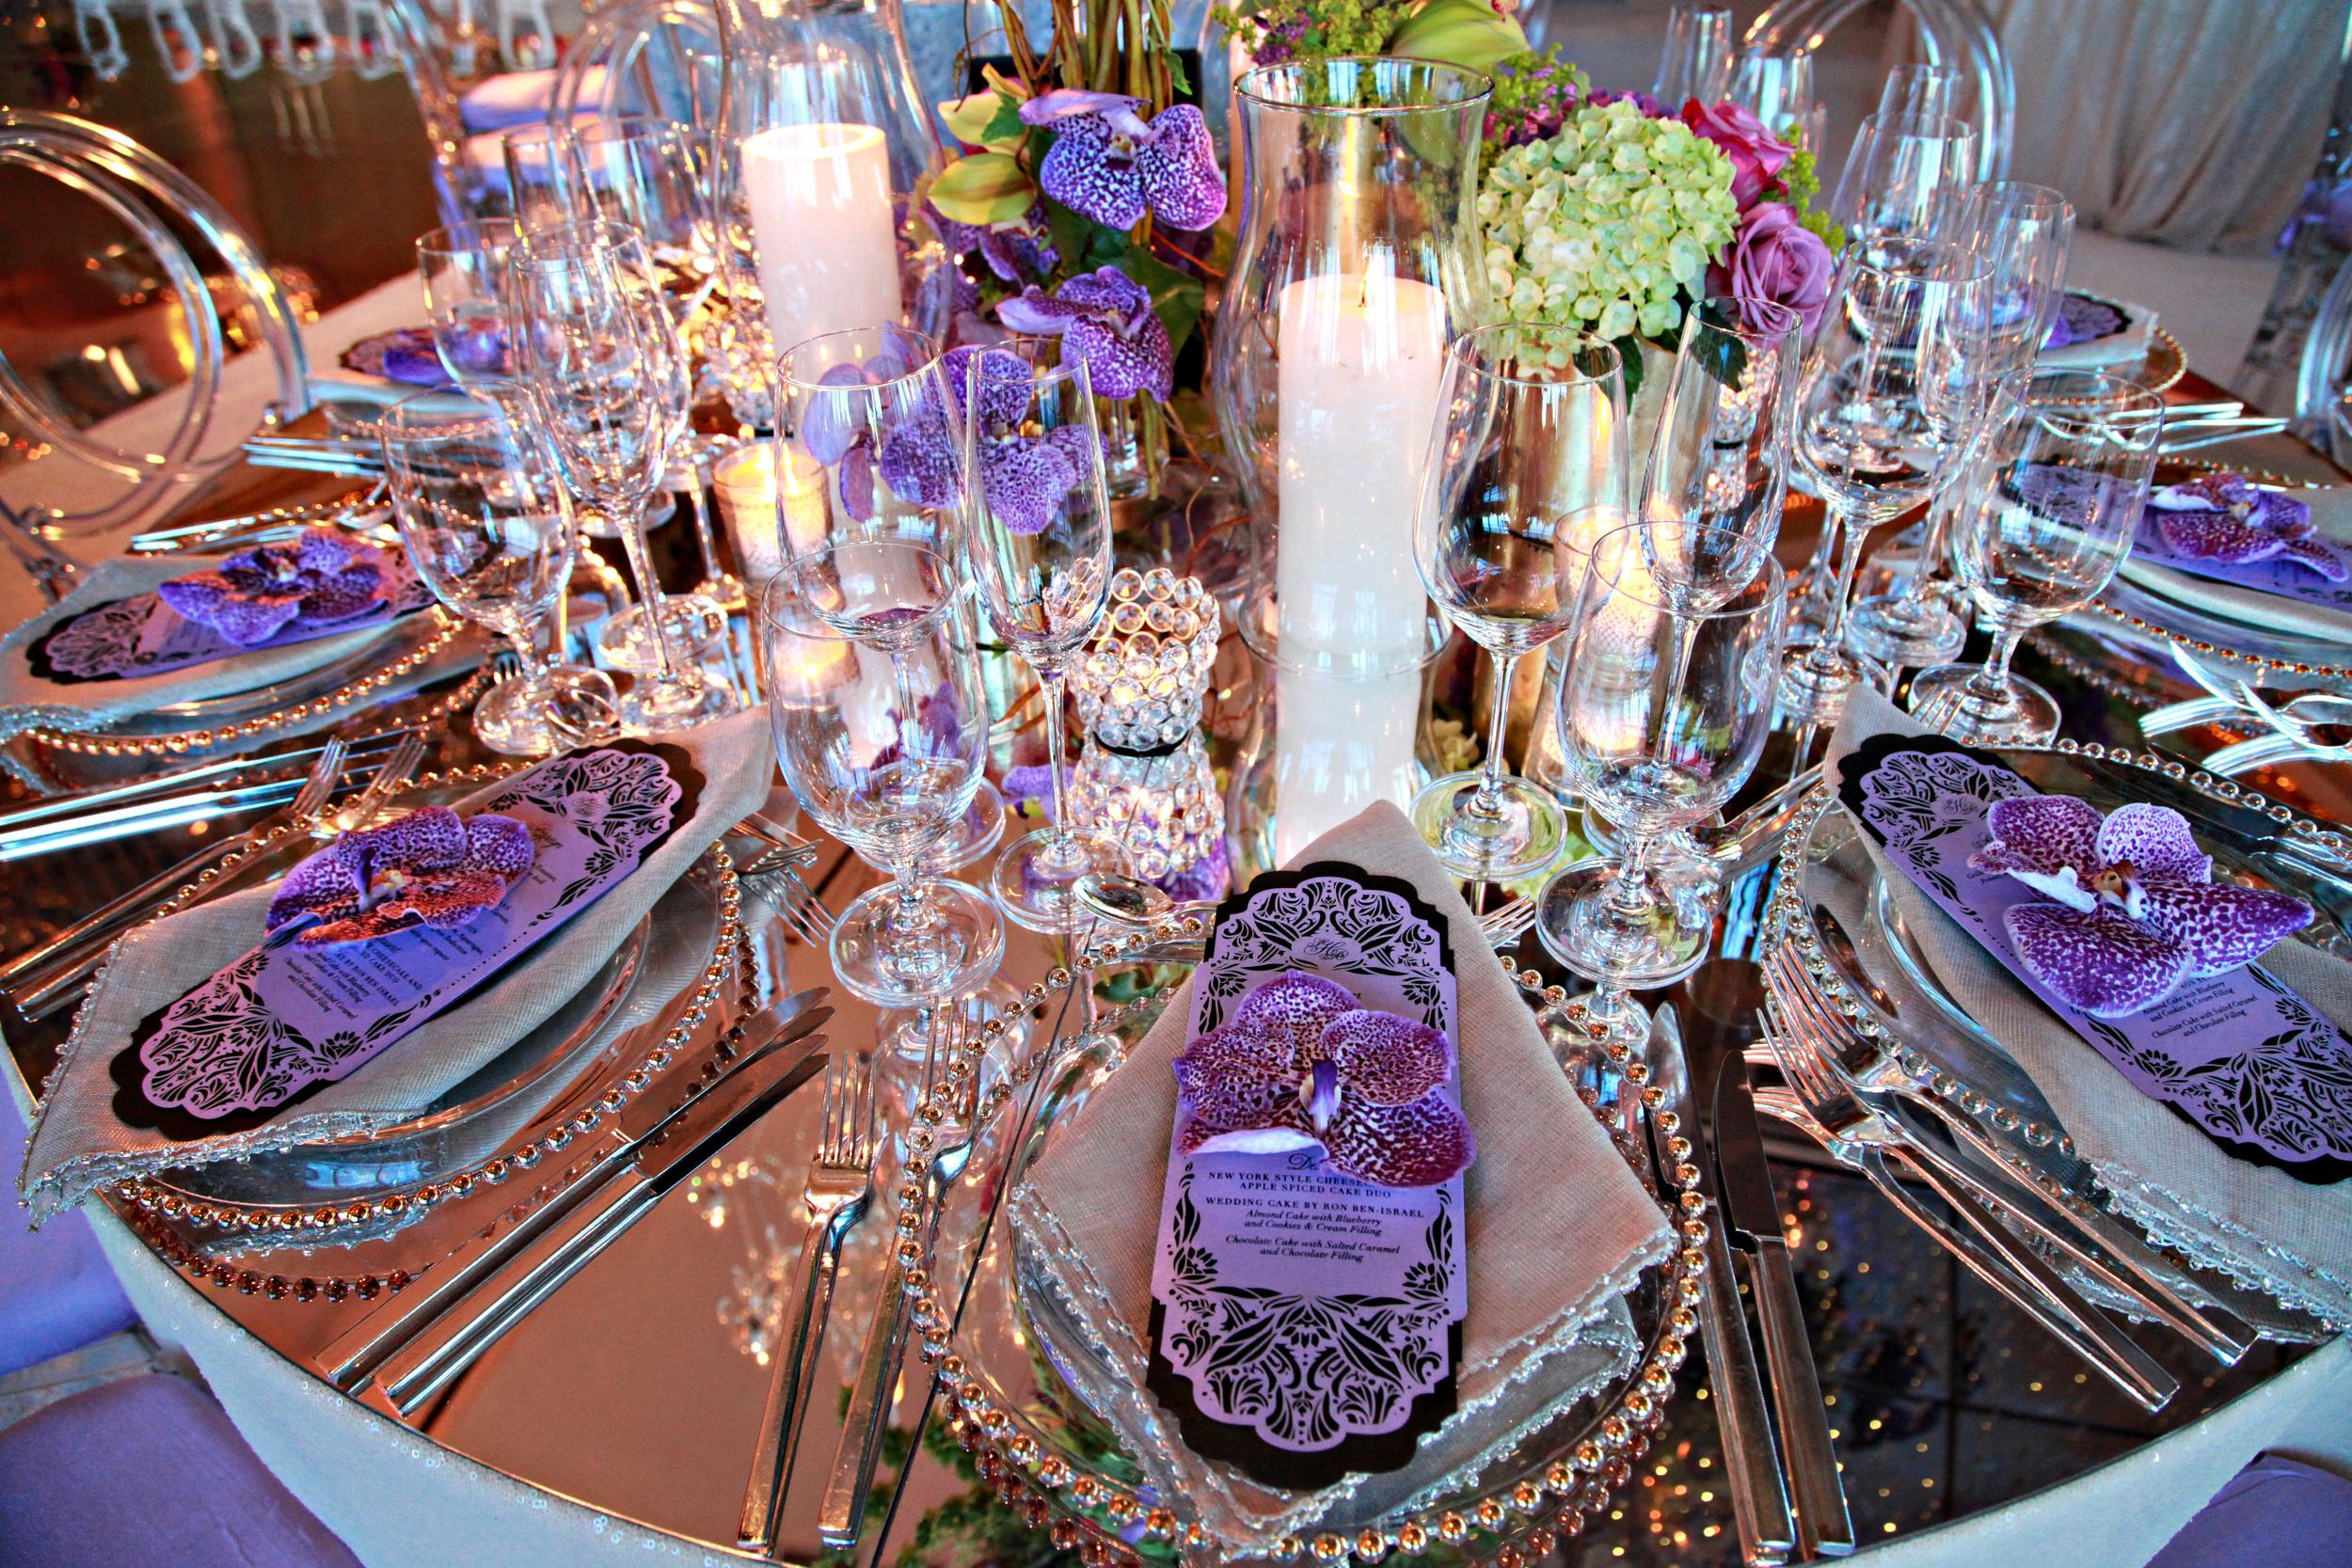 mandarin_oriental_new_york_city_branding_inspiration_lavender_silver_wedding_floral_purple_v284_30.jpg